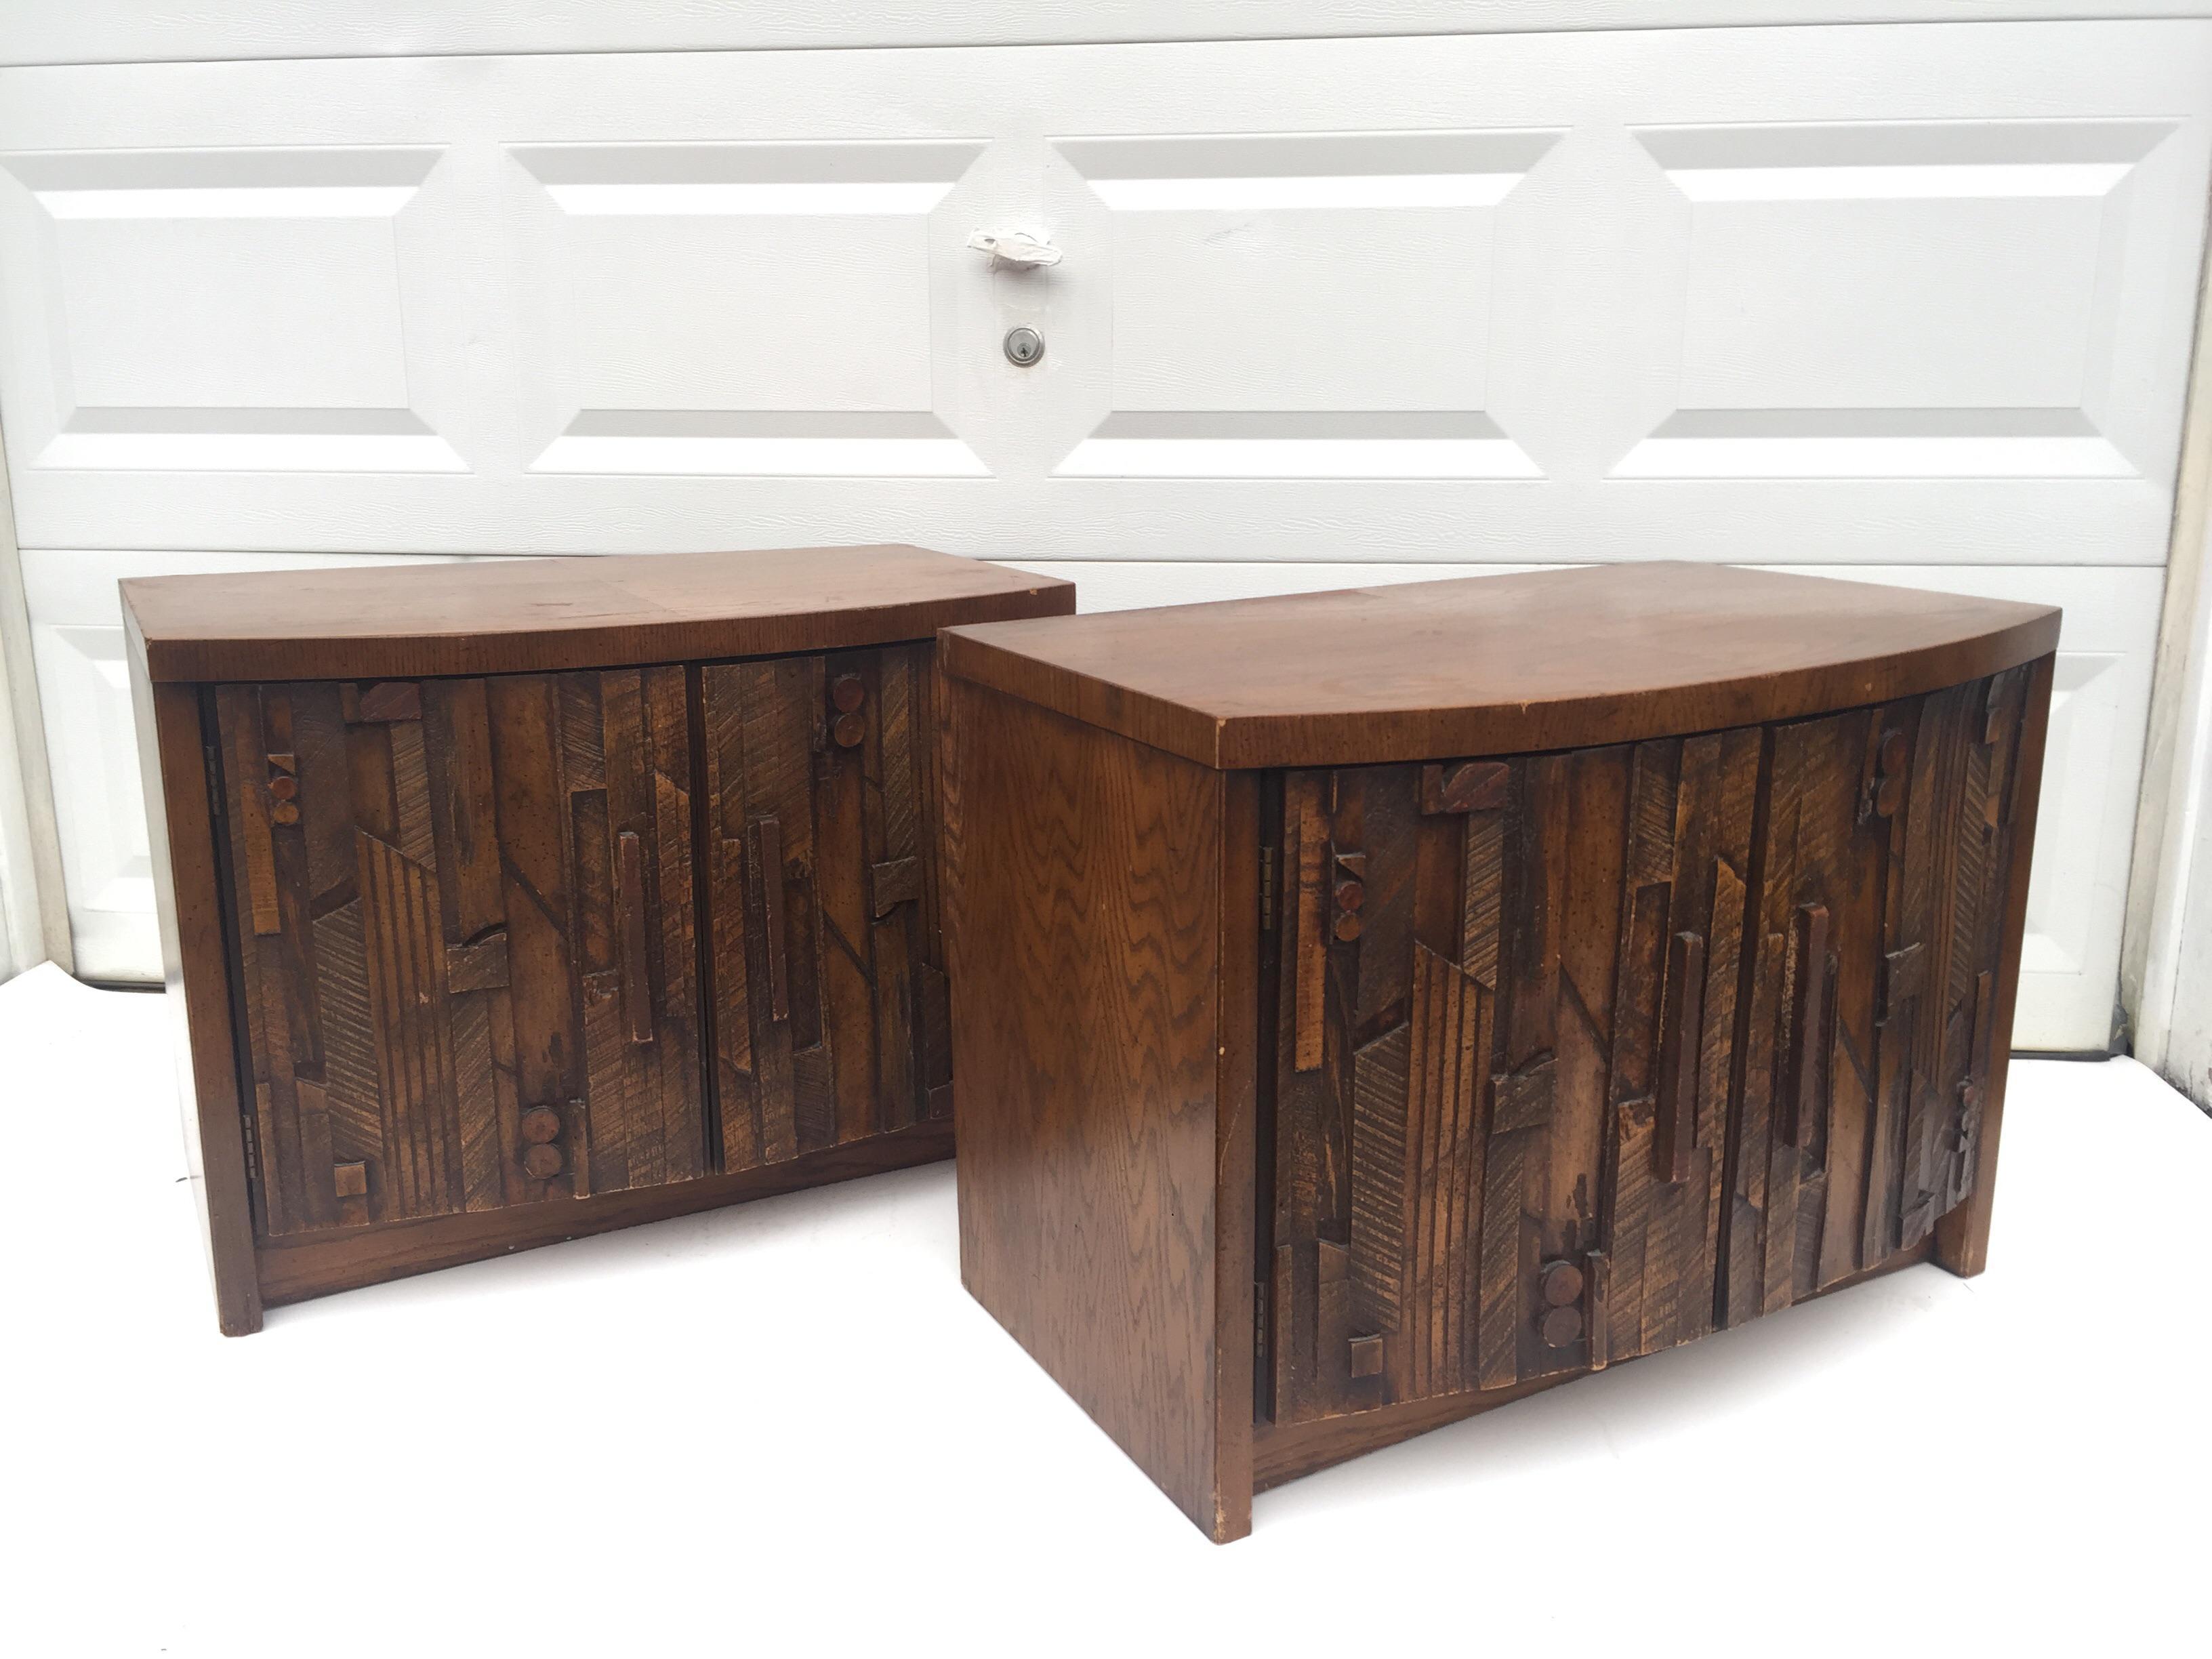 Vintage Brutalist Modern Lane Furniture Nightstands   A Pair   Image 2 Of 11